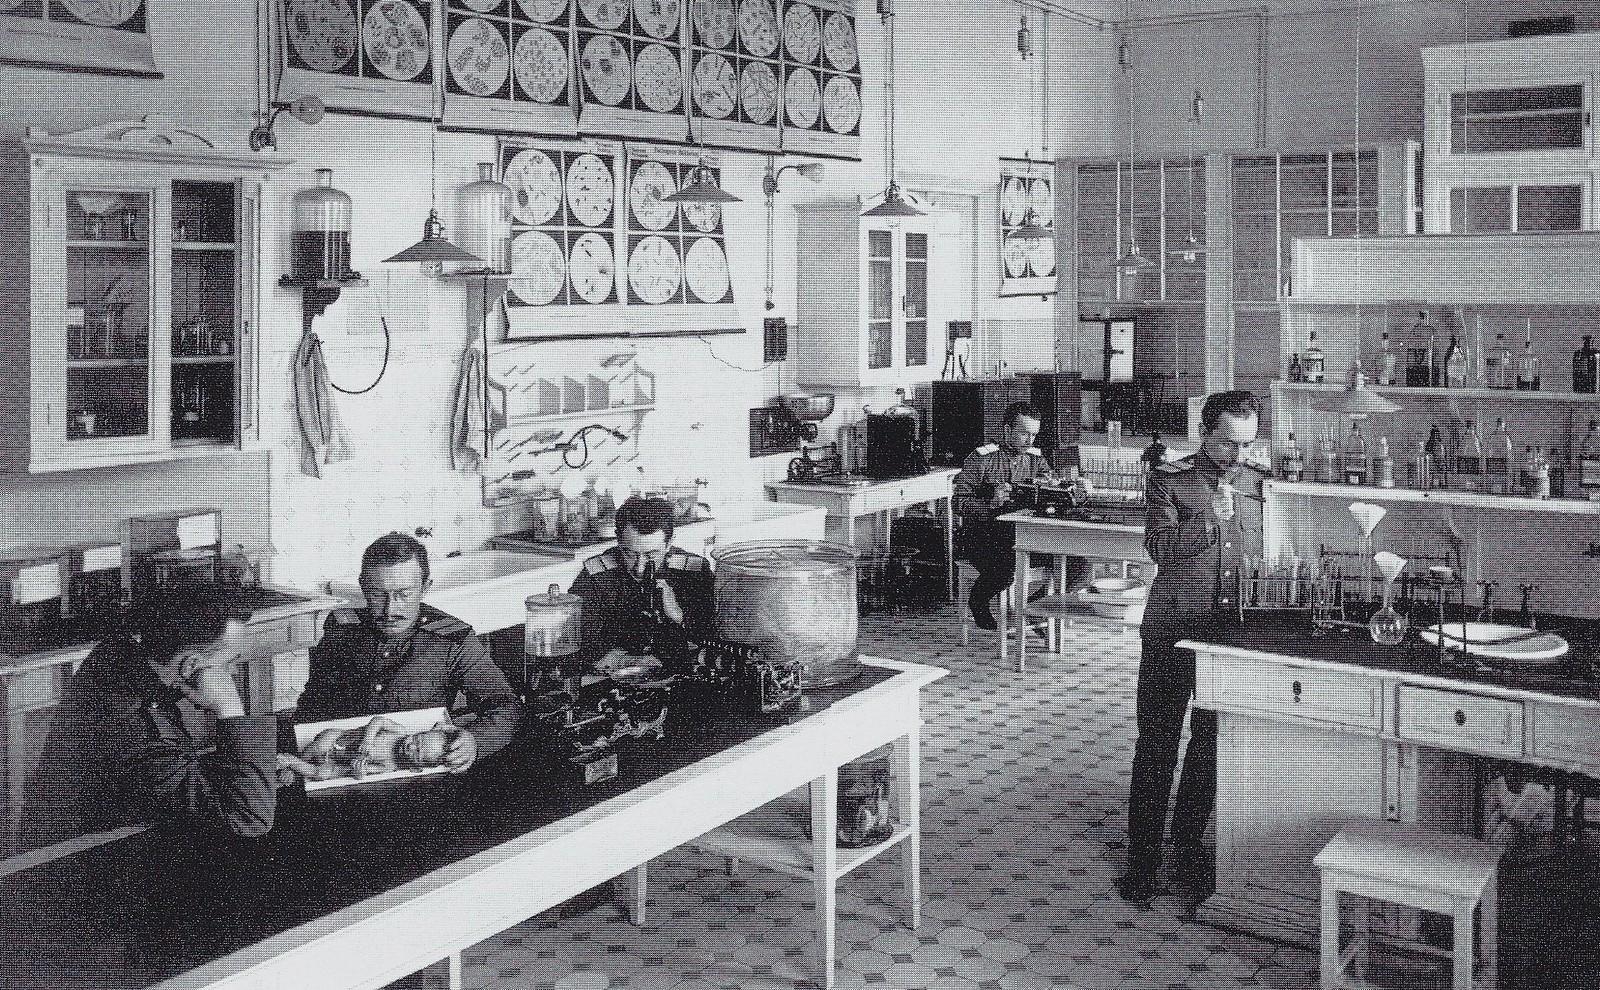 1910-е.  Императорская Военно-медицинская академия. Преподаватели и слушатели в лаборатории ВМА